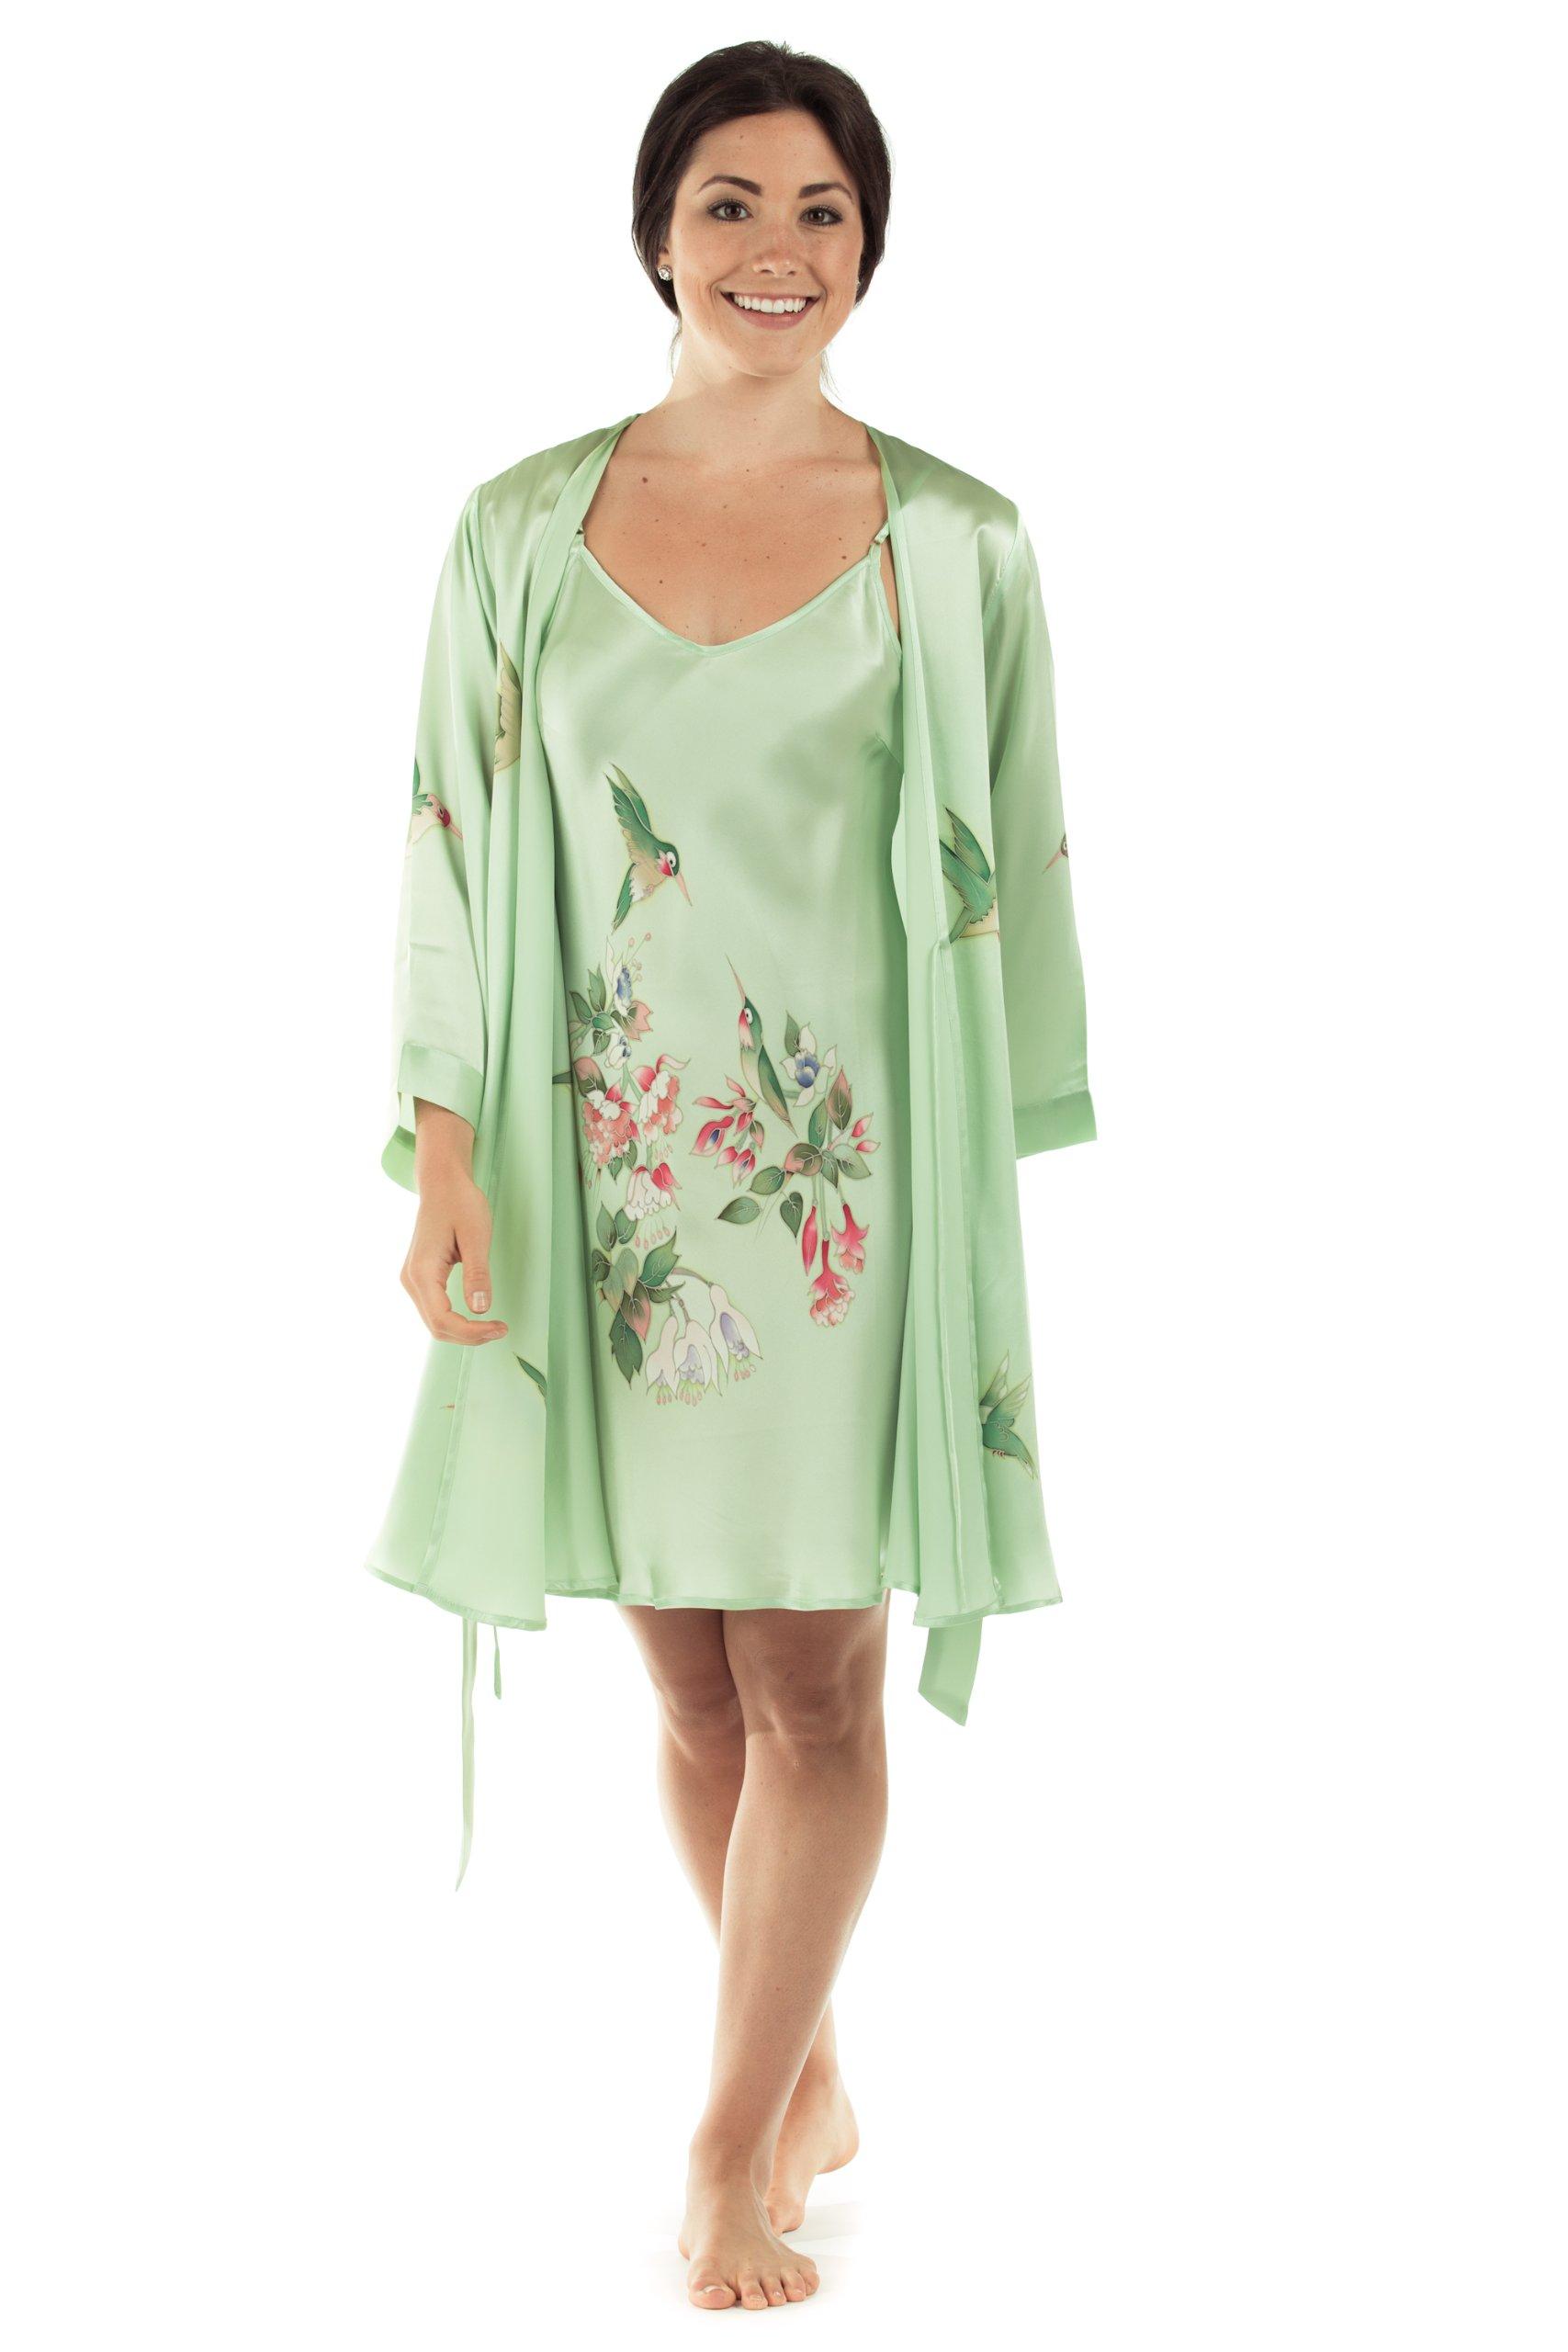 Women's Silk Nightgown Robe Set - Elegant Gifts by TexereSilk (The Hummingbirds, Celadon Green, Medium) Beautiful Sleepwear Set for Mom Sister Wife Girlfriend Daughter Fiancee WS0602-CDN-M